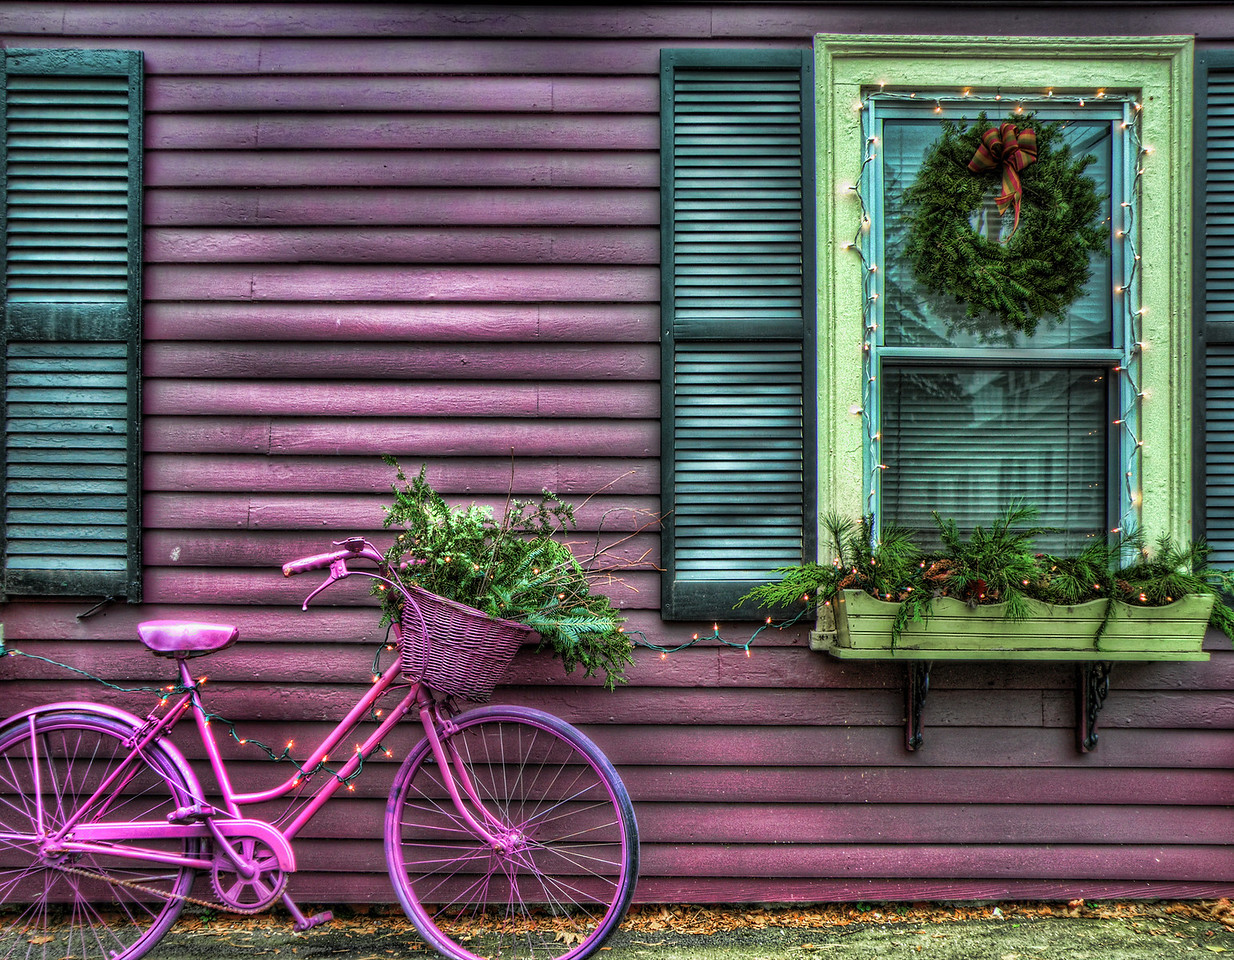 The Purple Bike